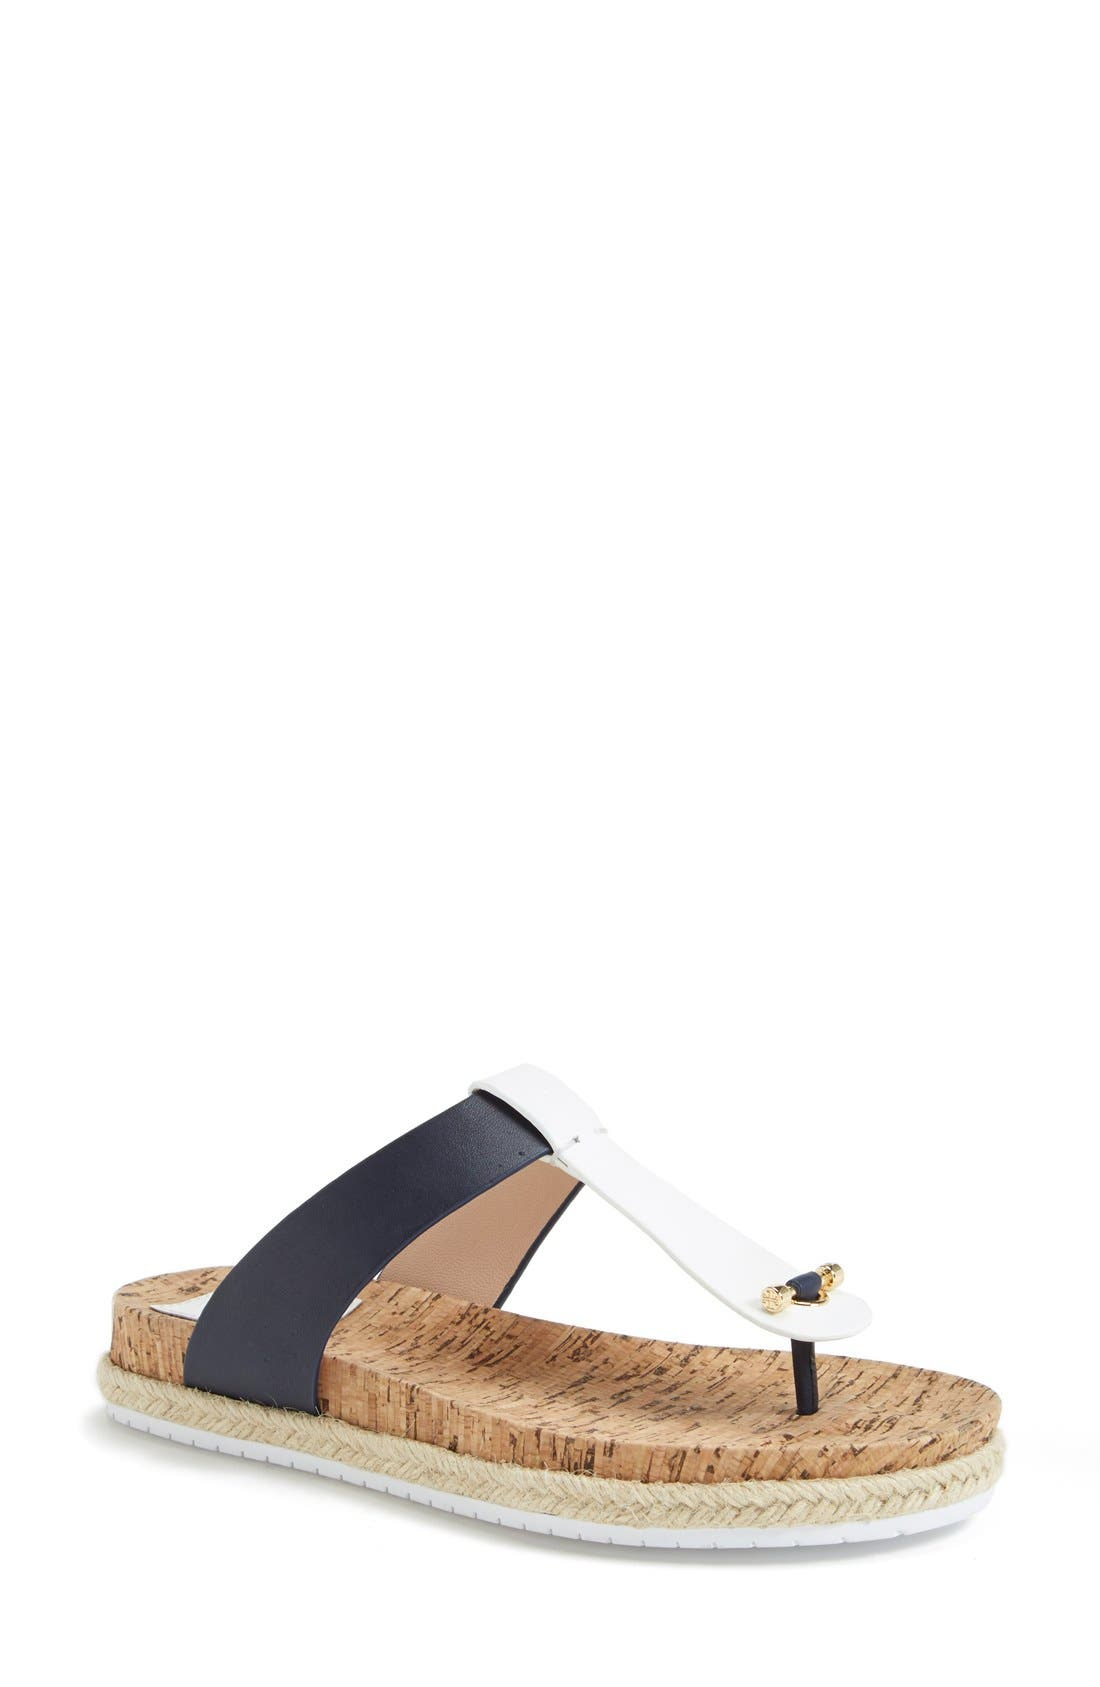 Leather & Cork Thong Sandal,                             Main thumbnail 1, color,                             462